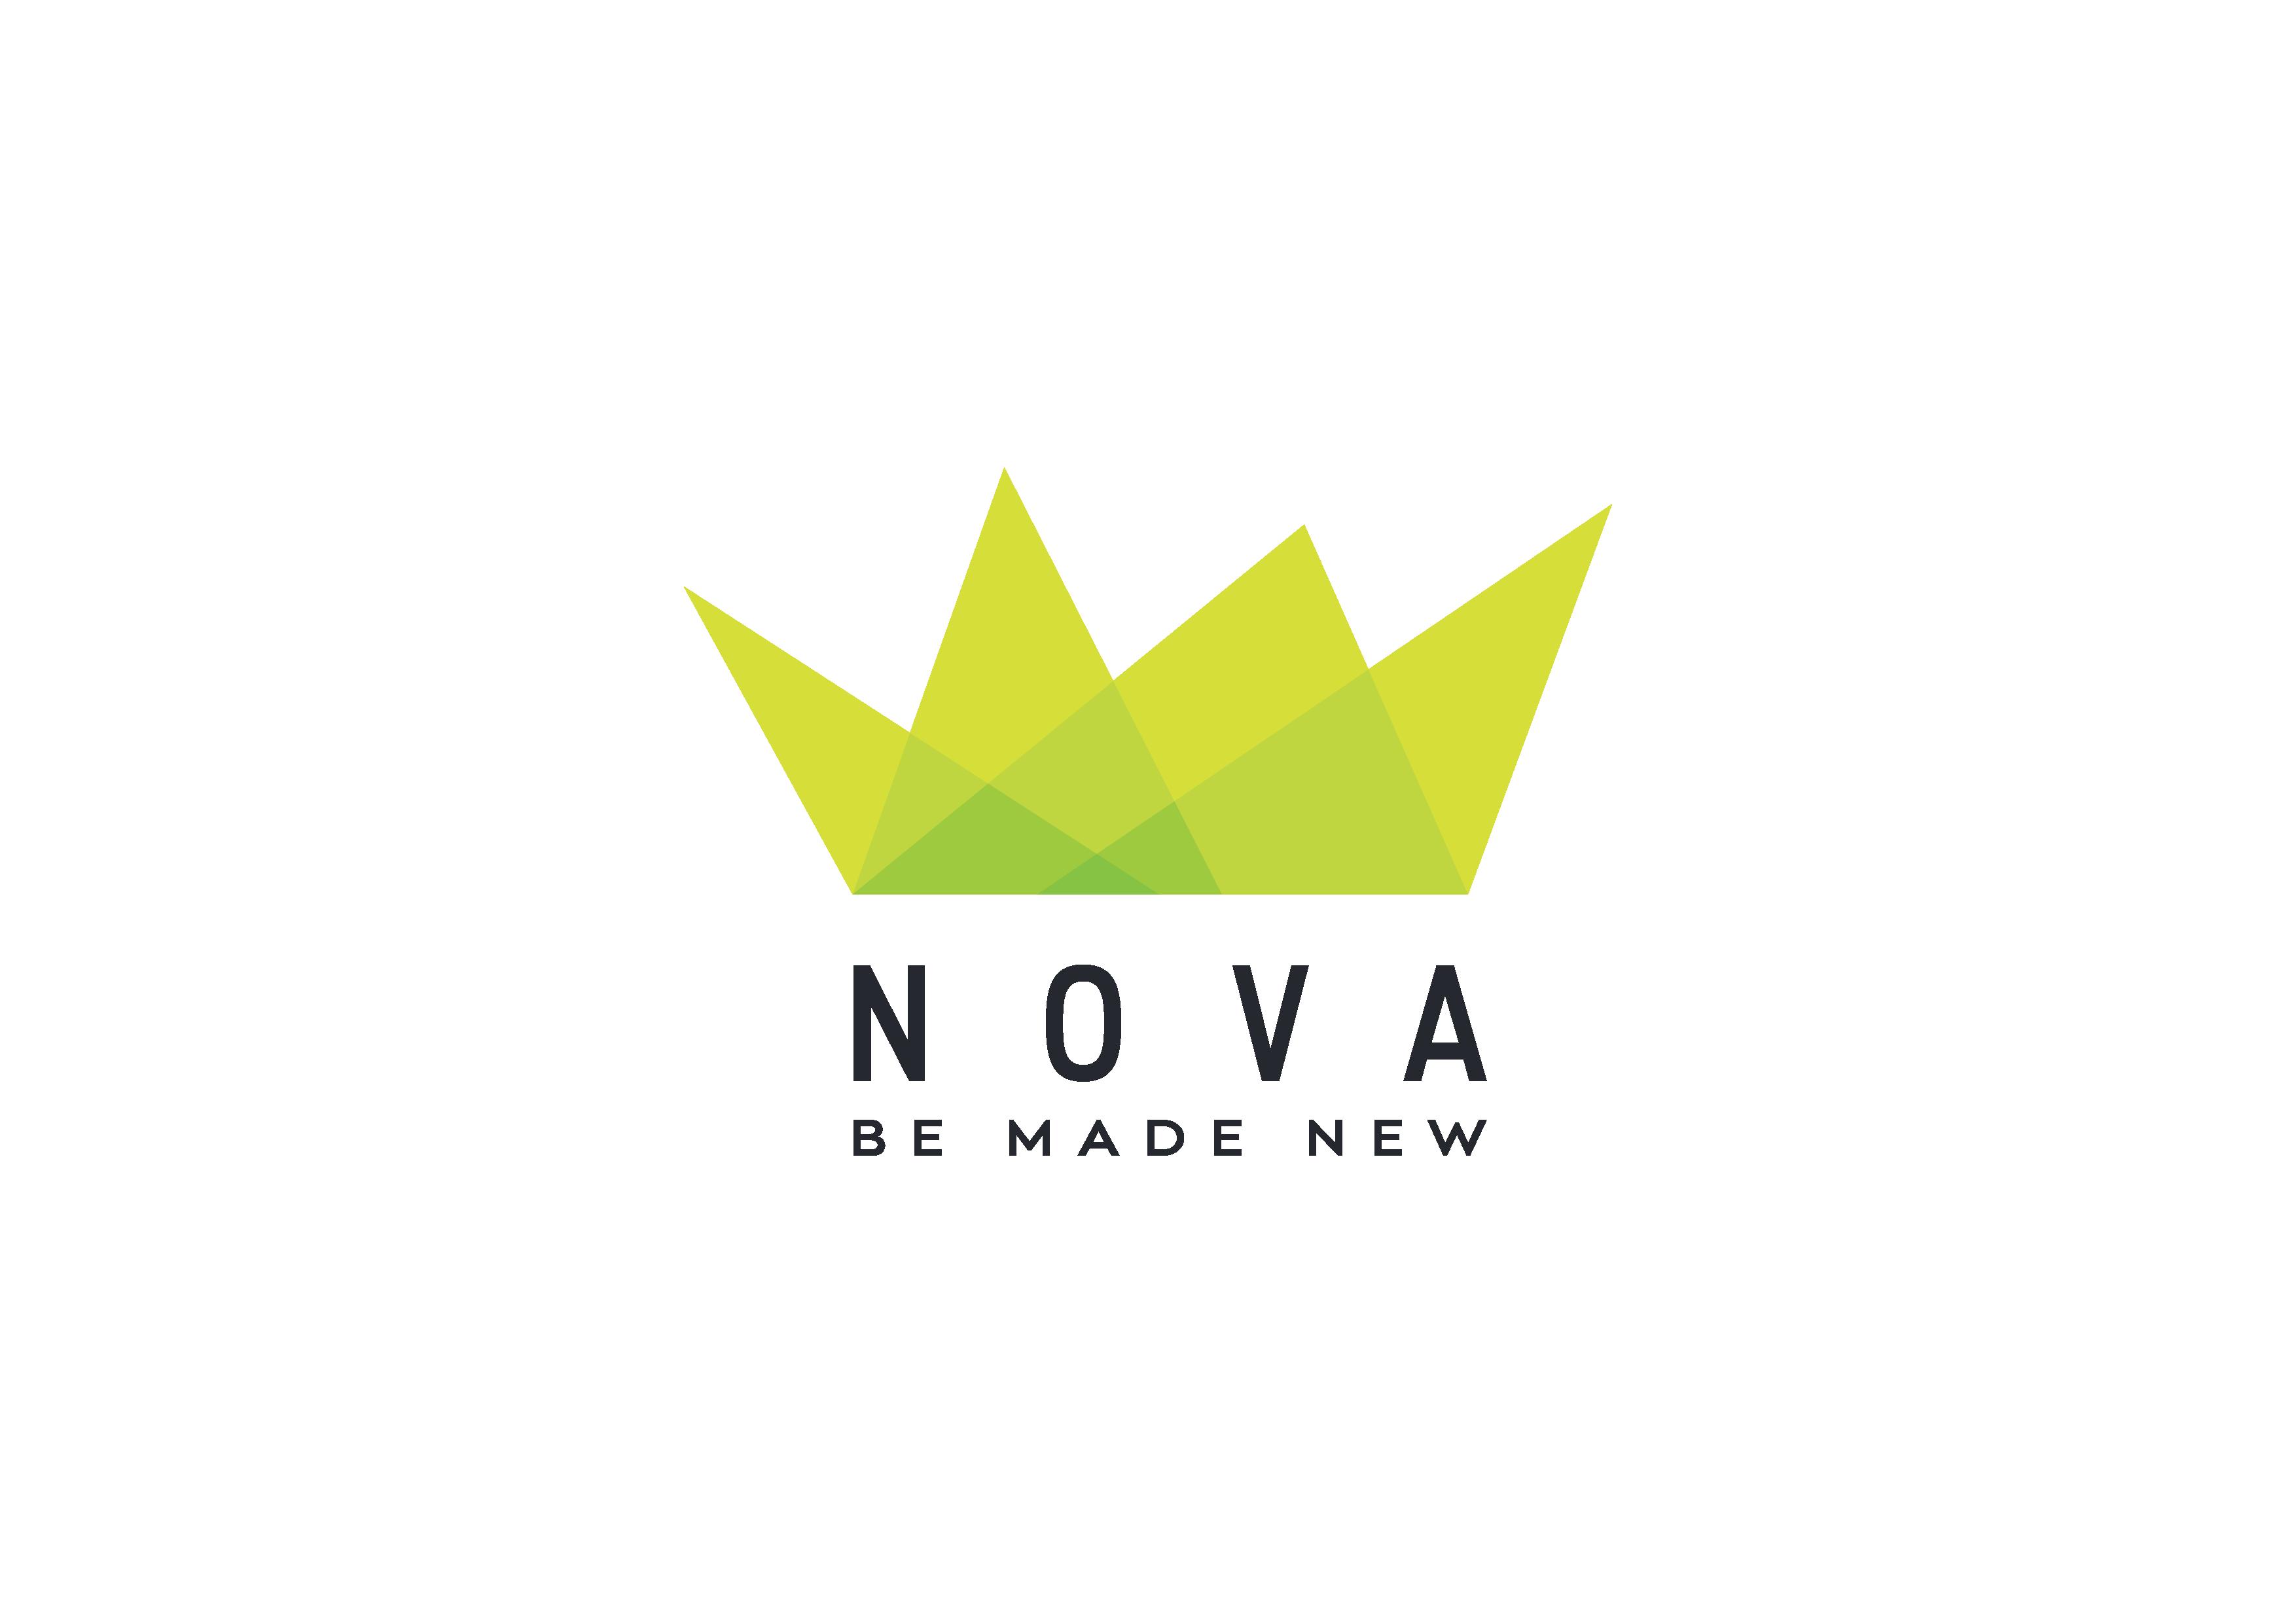 Design a Camp Nova graphic that will inspire a generation